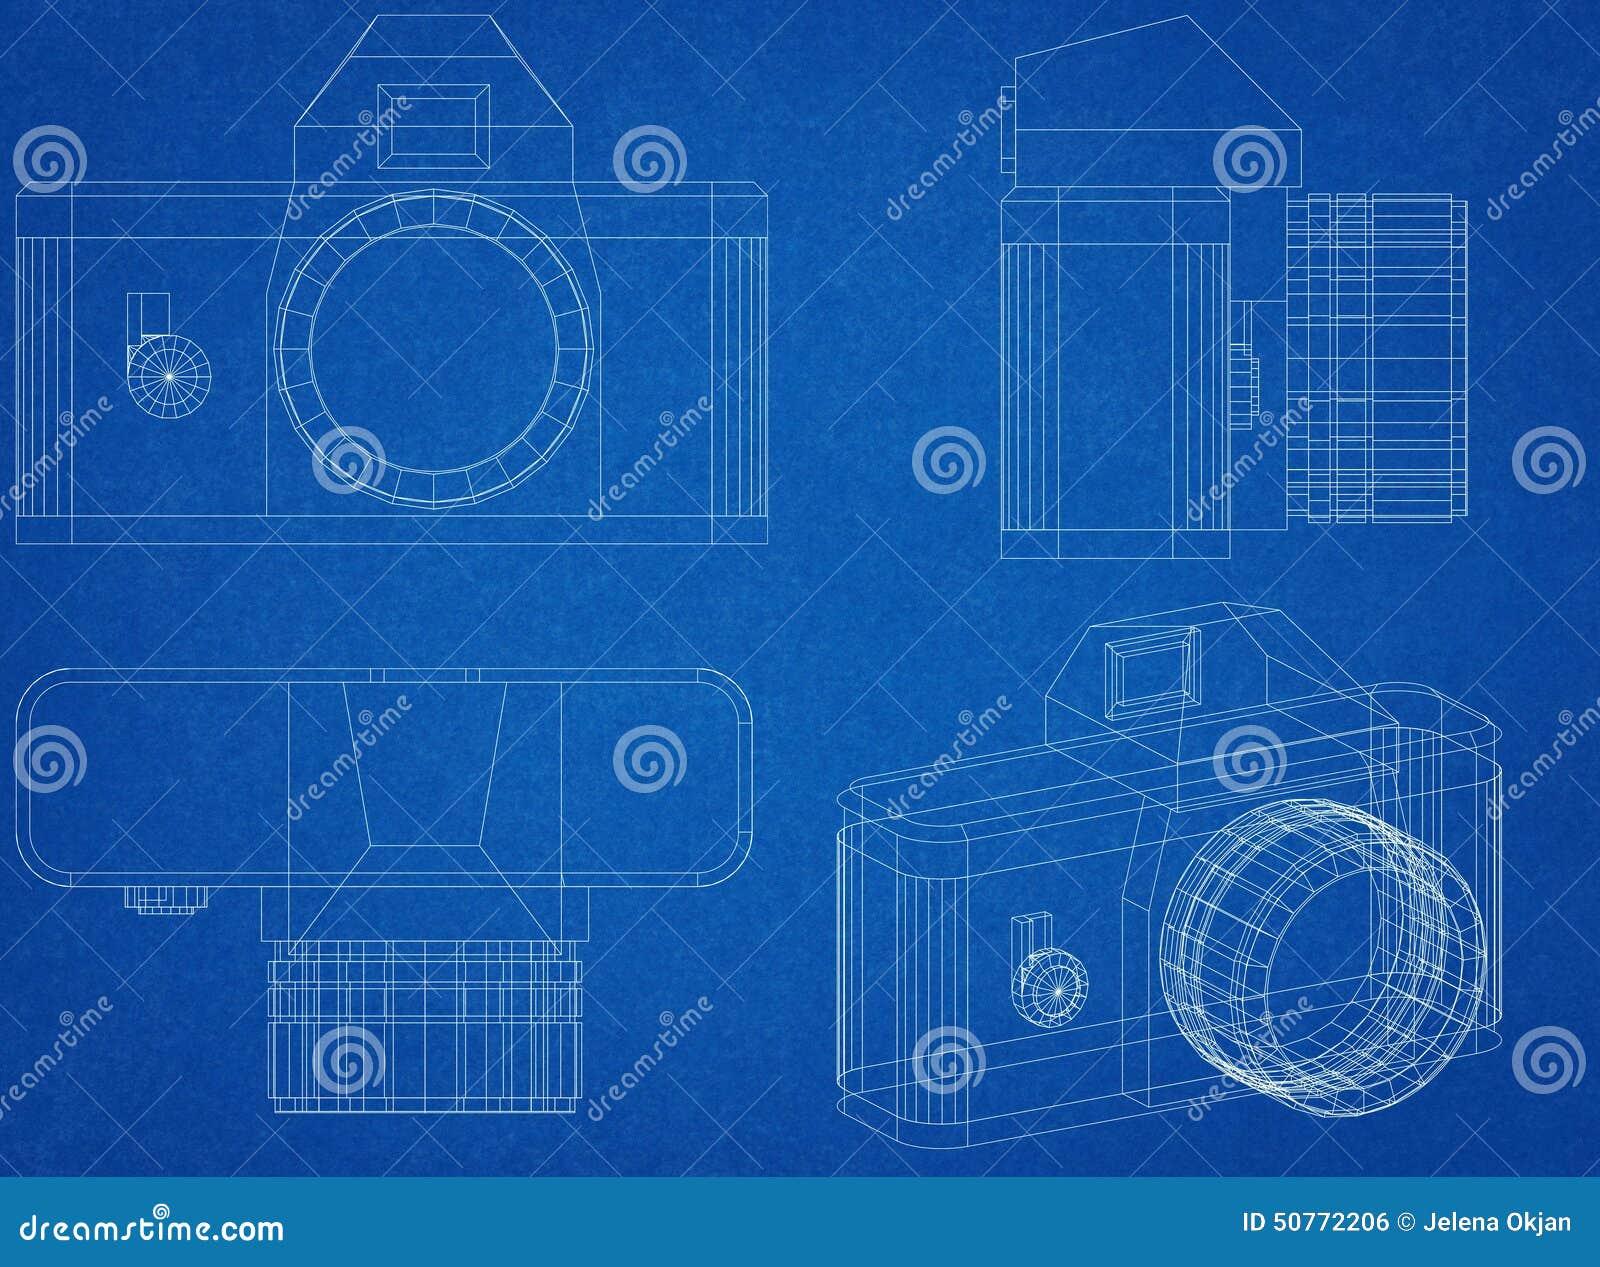 Camera blueprint stock illustration illustration of computer 50772206 camera blueprint malvernweather Choice Image